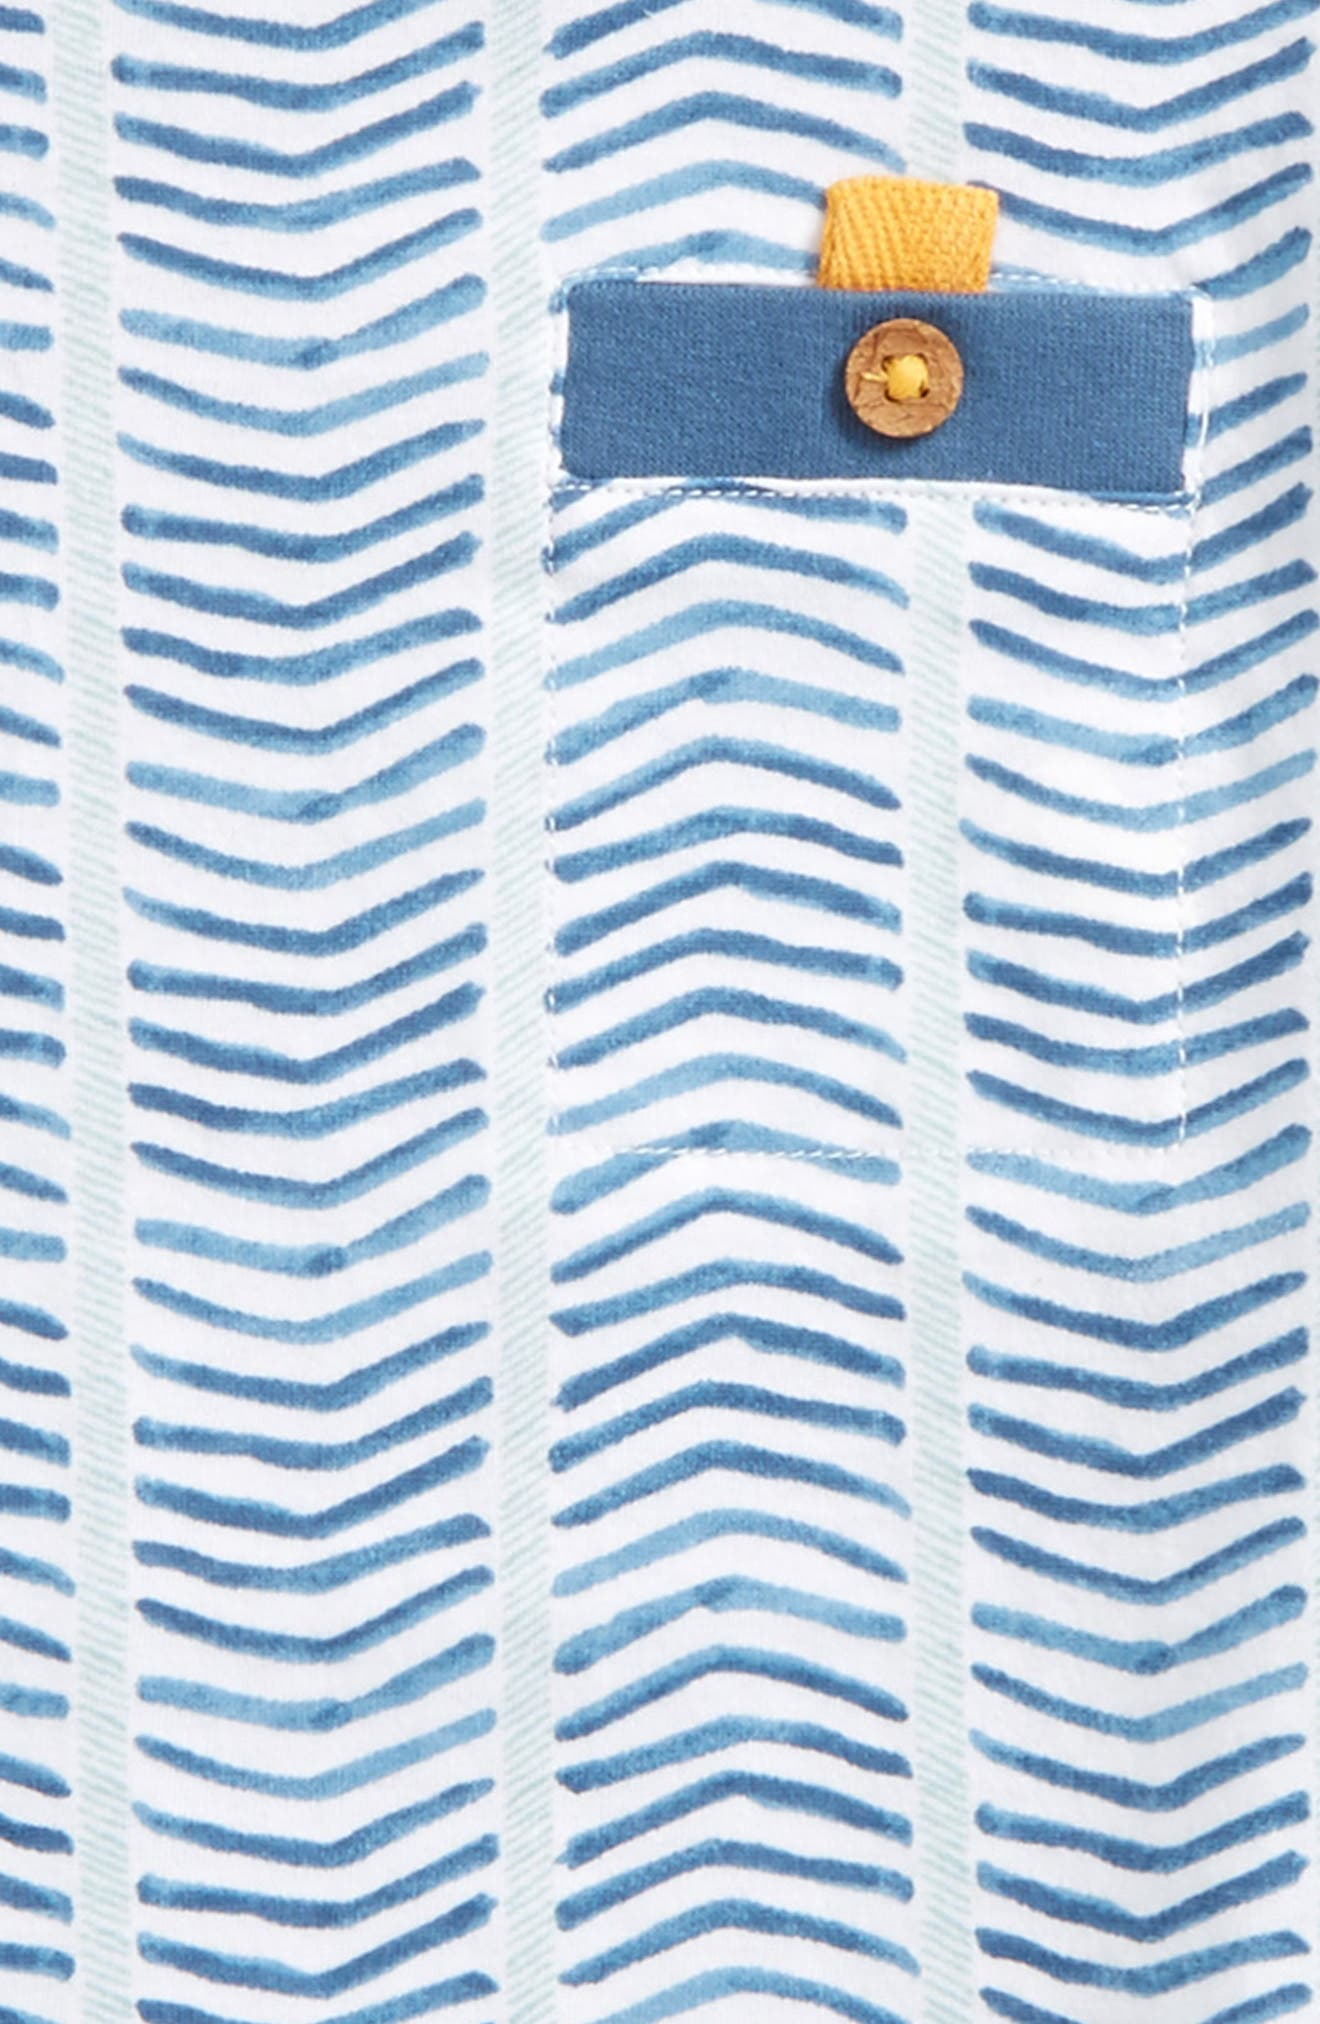 Chevron Stripe Organic Cotton T-Shirt,                             Alternate thumbnail 2, color,                             430